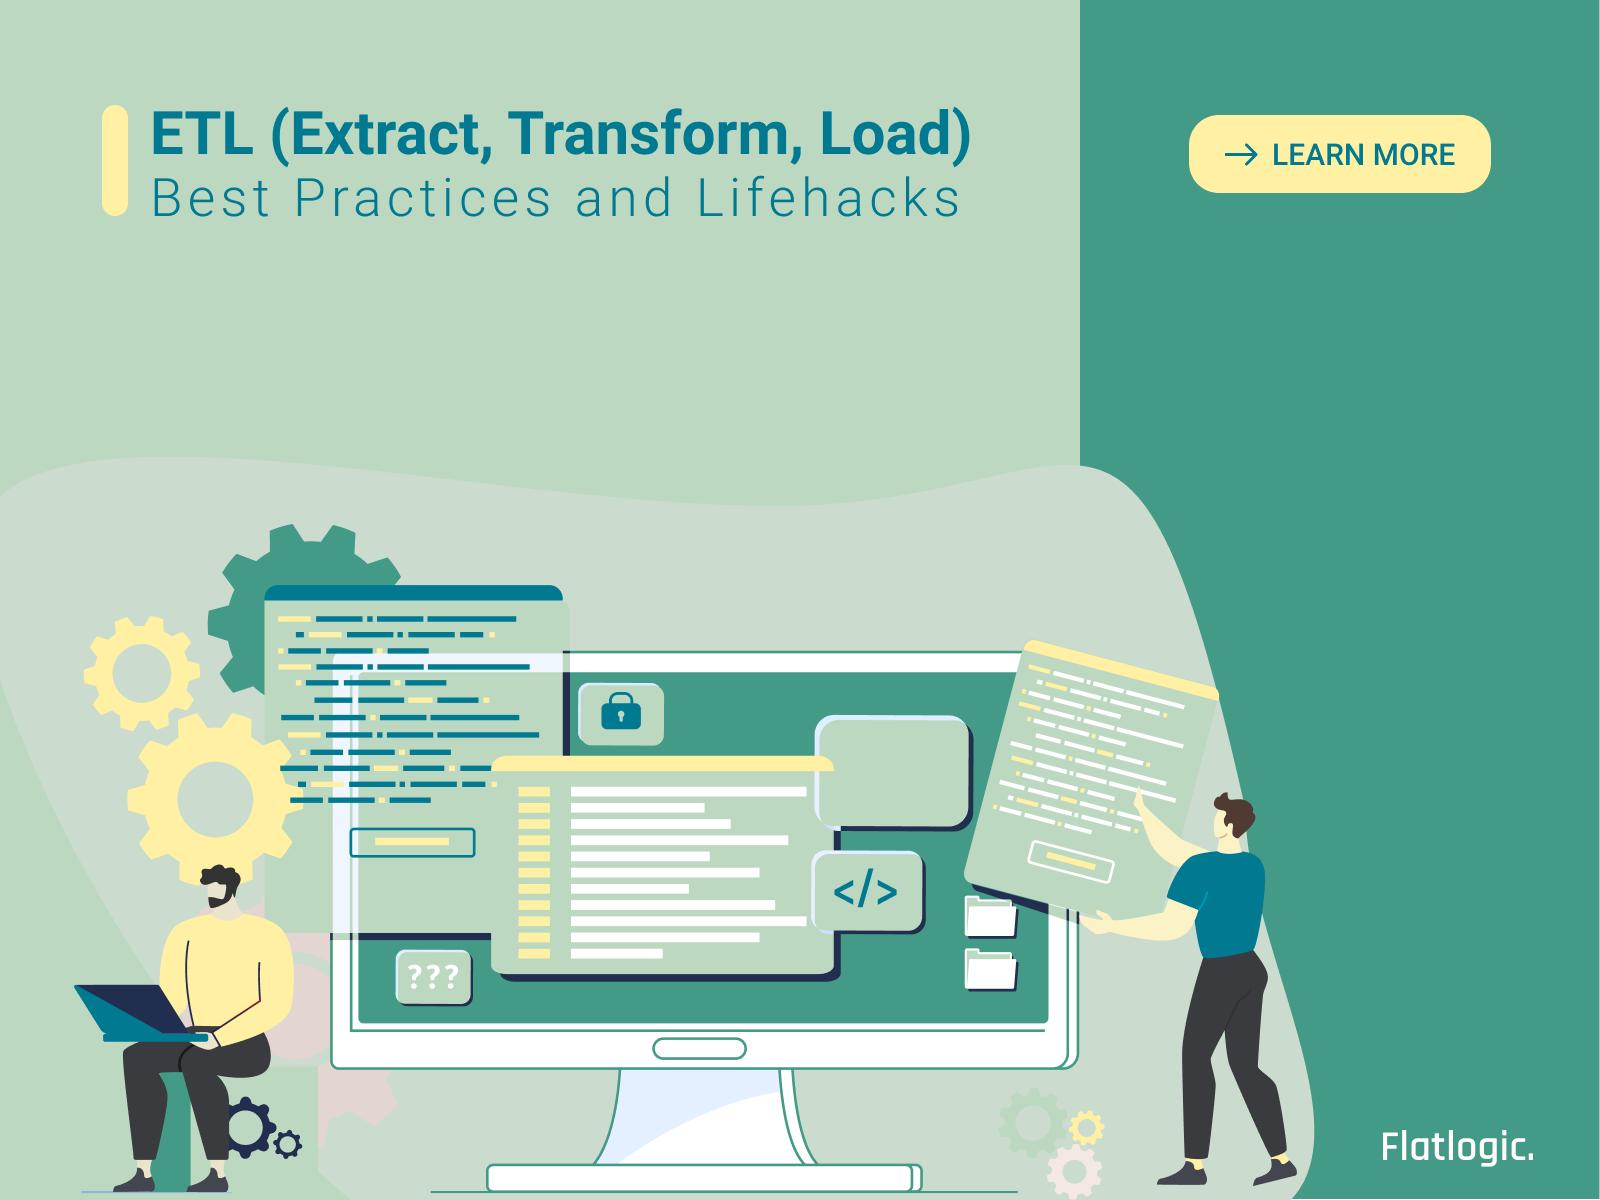 ETL (Extract, Transform, Load). Best Practices ETL Process and Lifehacks - Flatlogic Blog